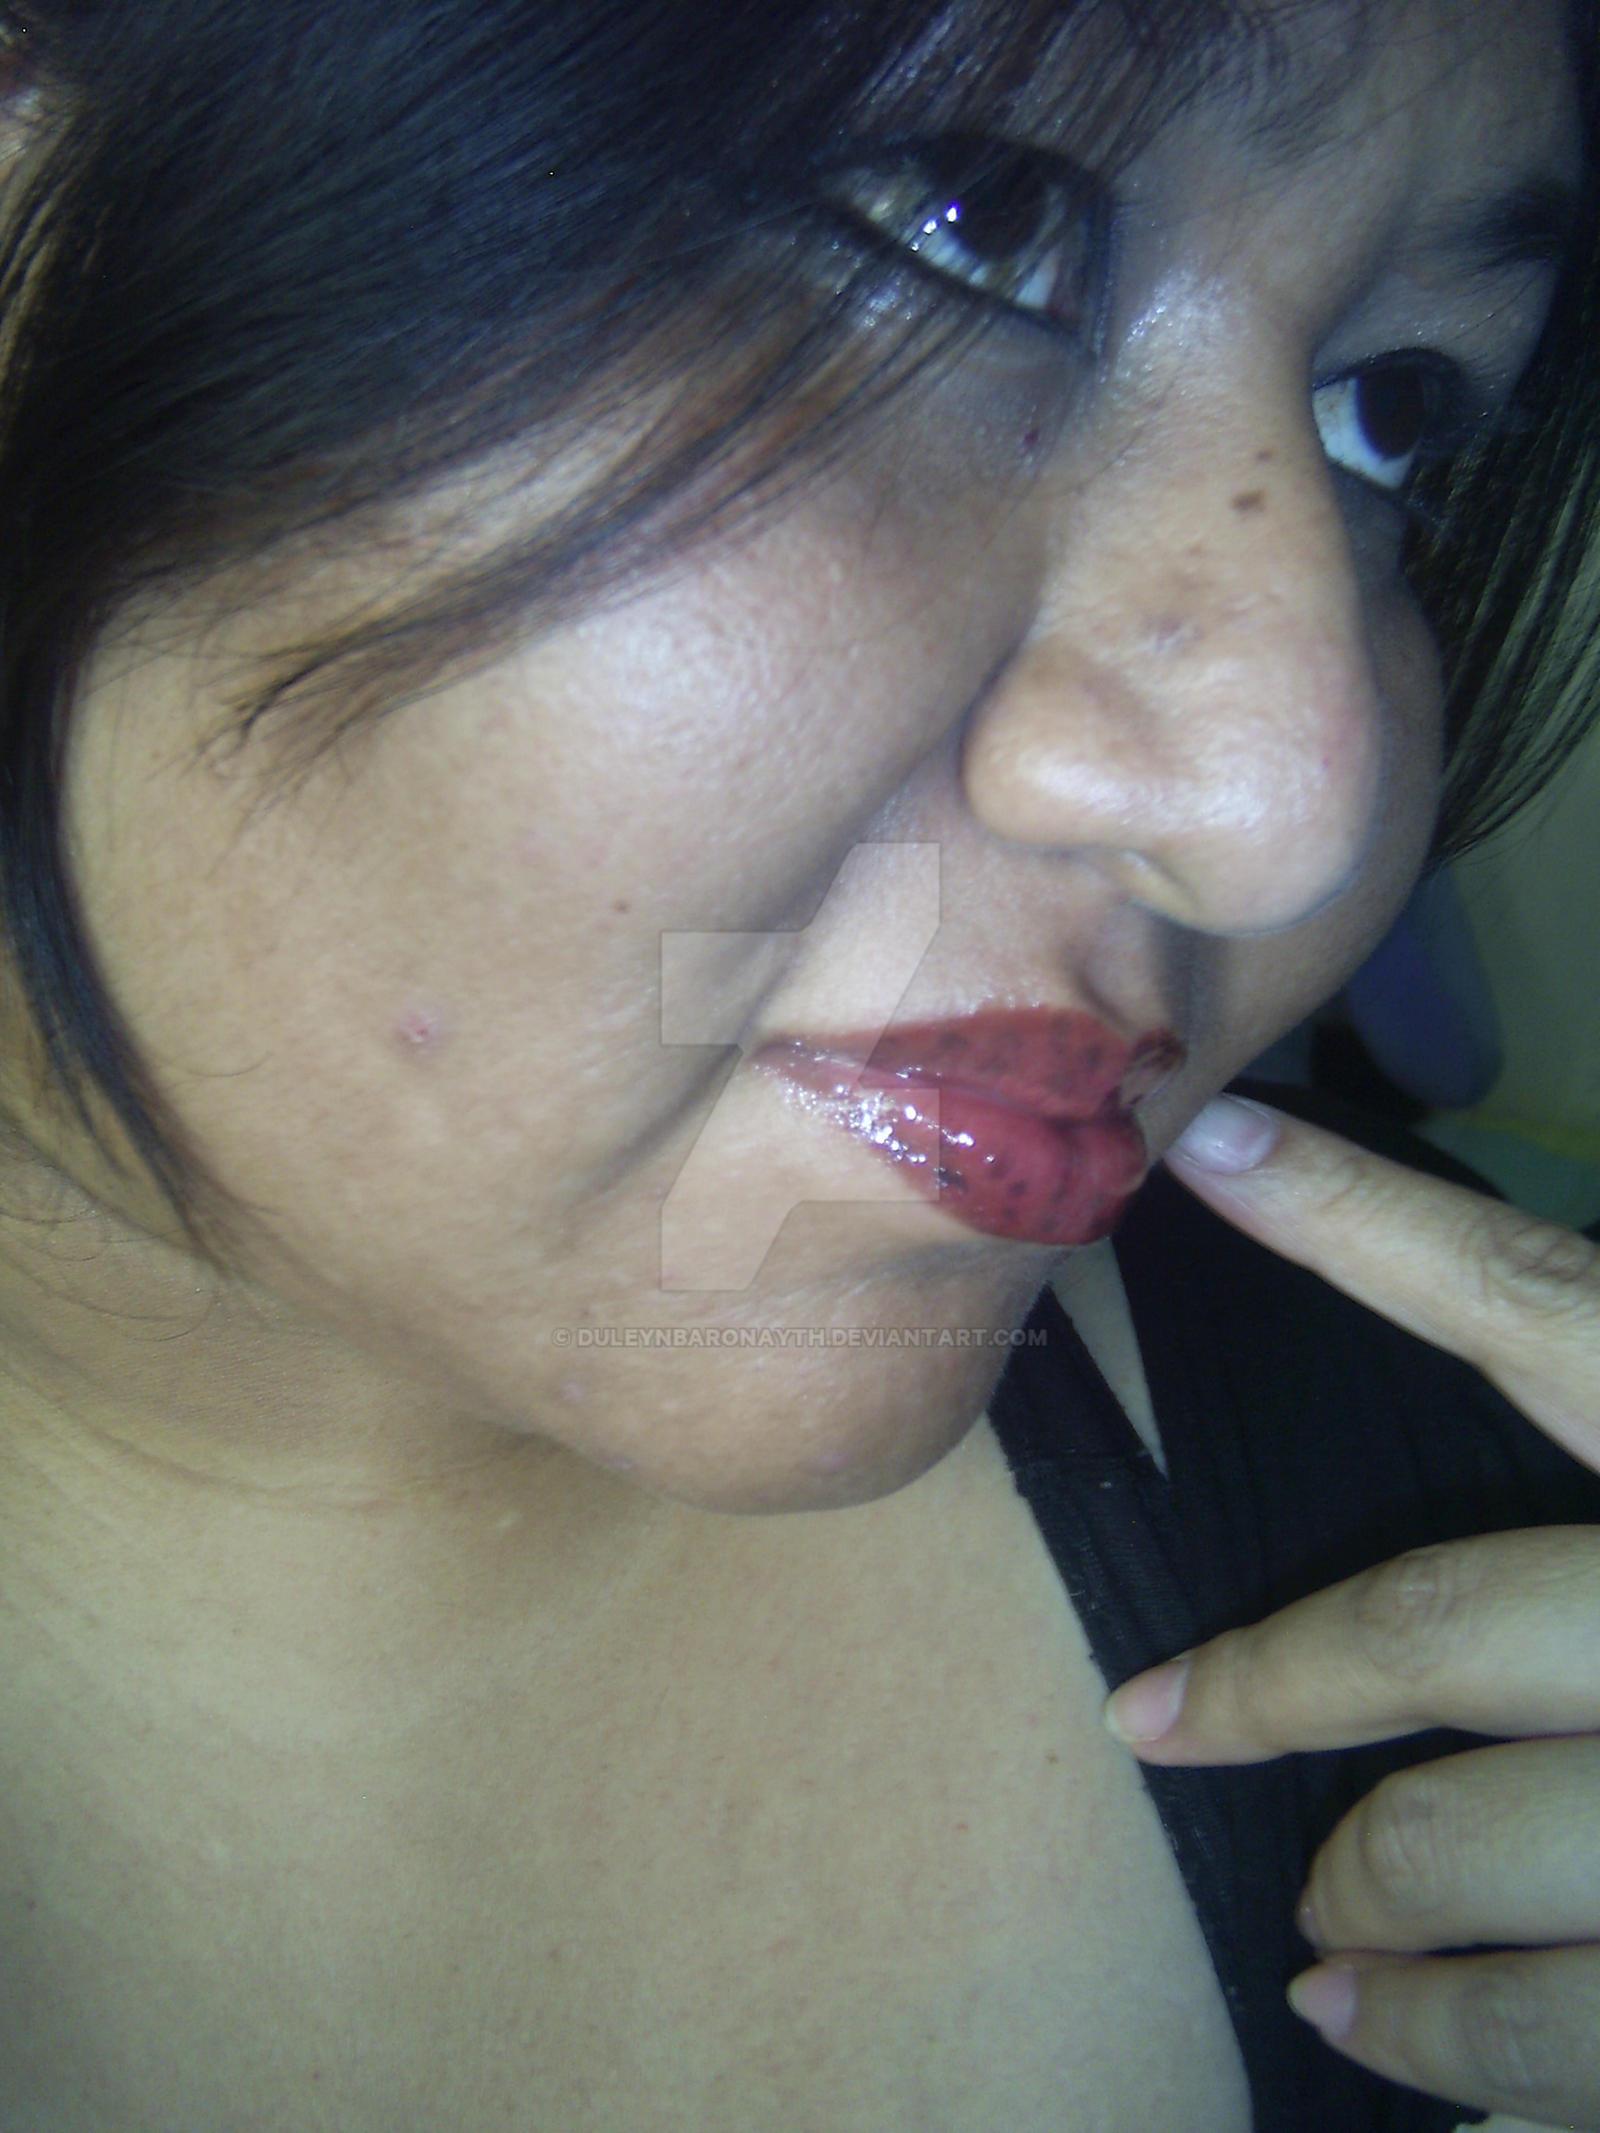 DuleynBaronayth's Profile Picture